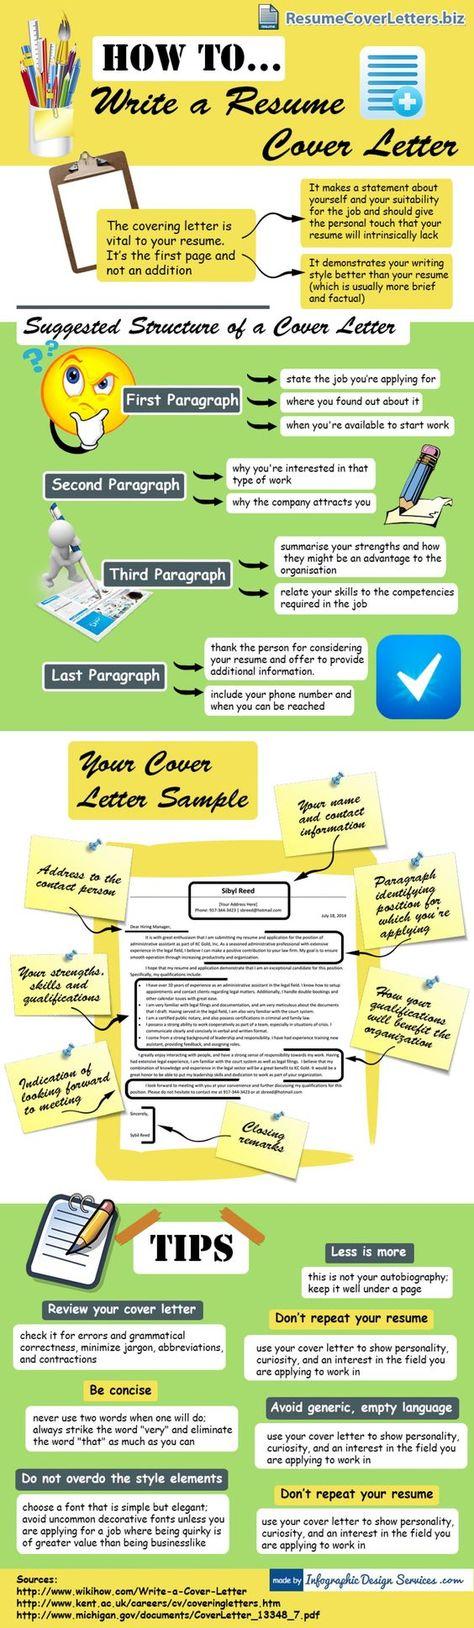 Resume Cover Letter Writing Tips